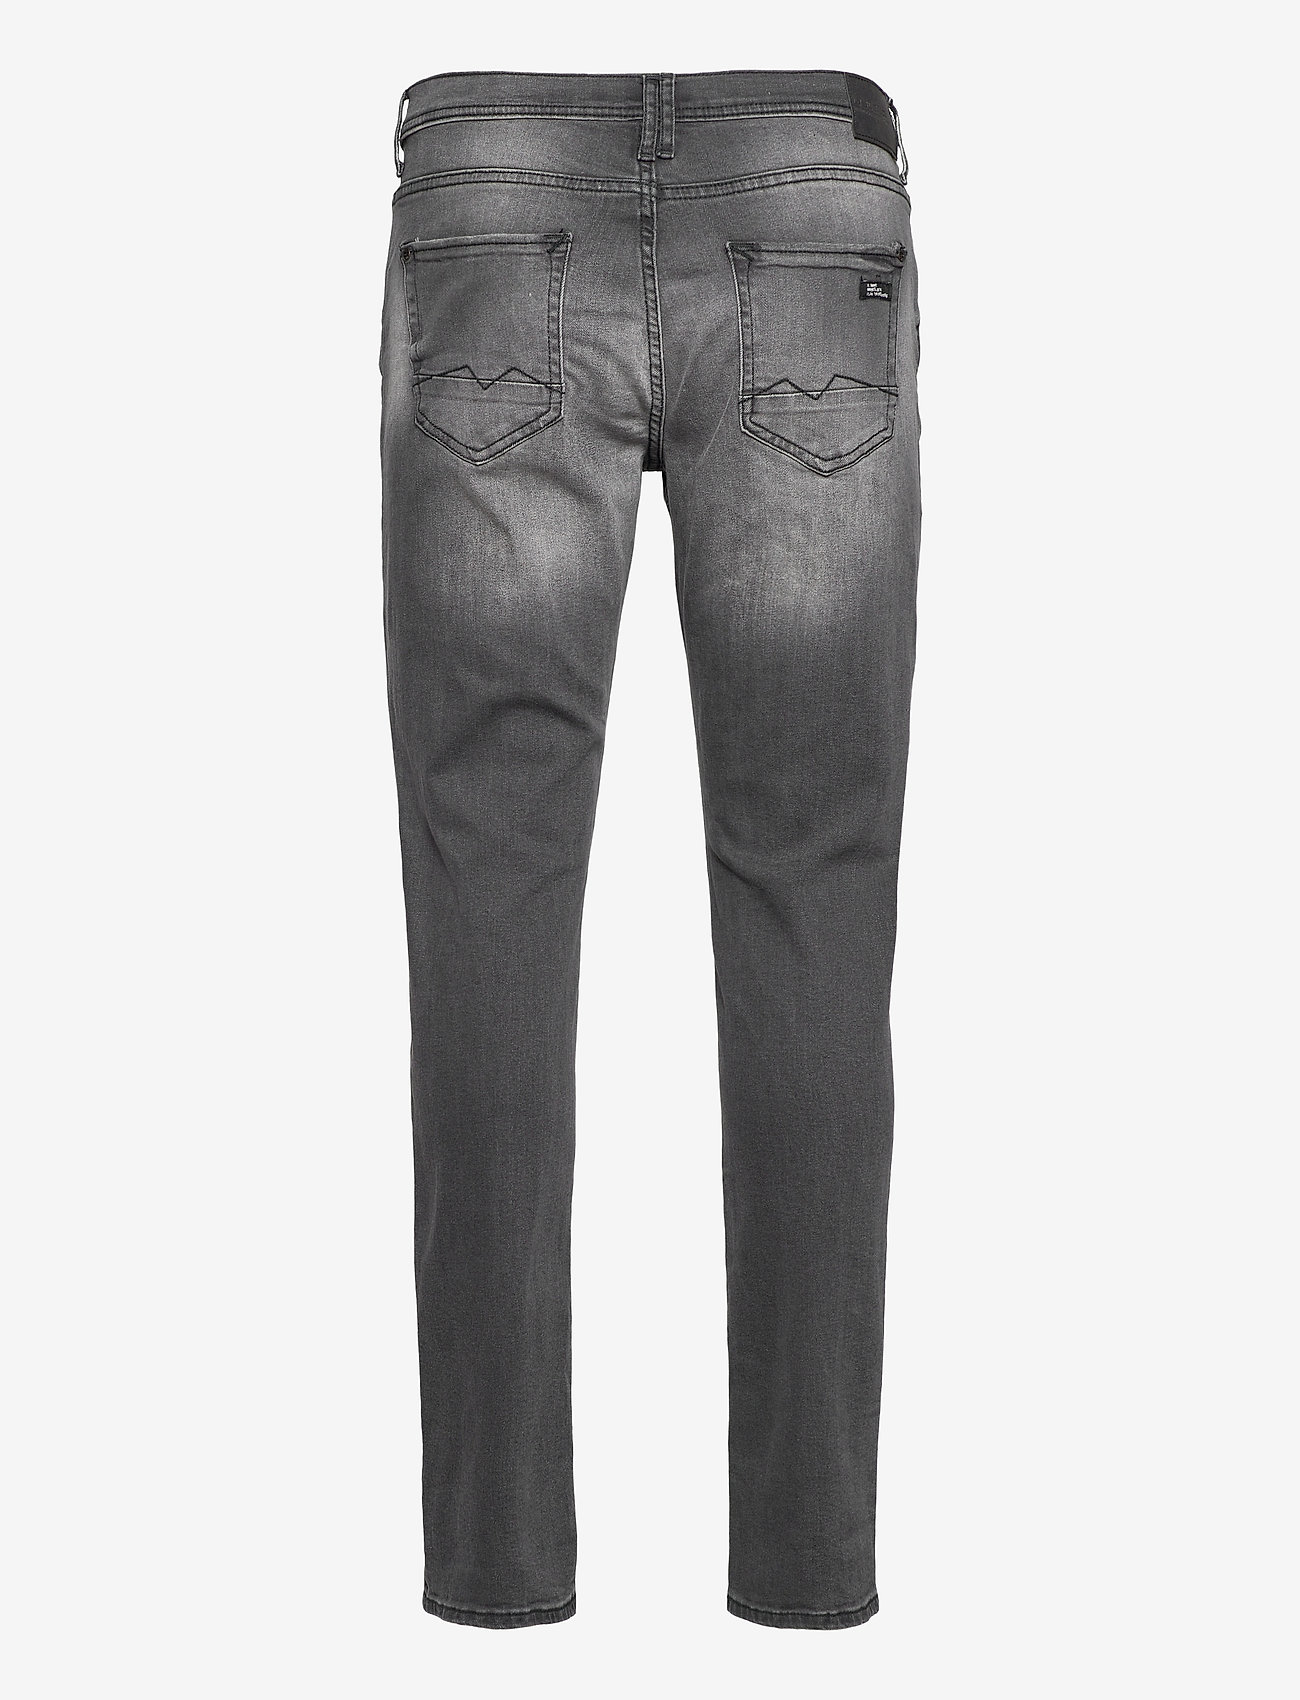 Blend - Jeans - Clean - slim jeans - denim grey - 1